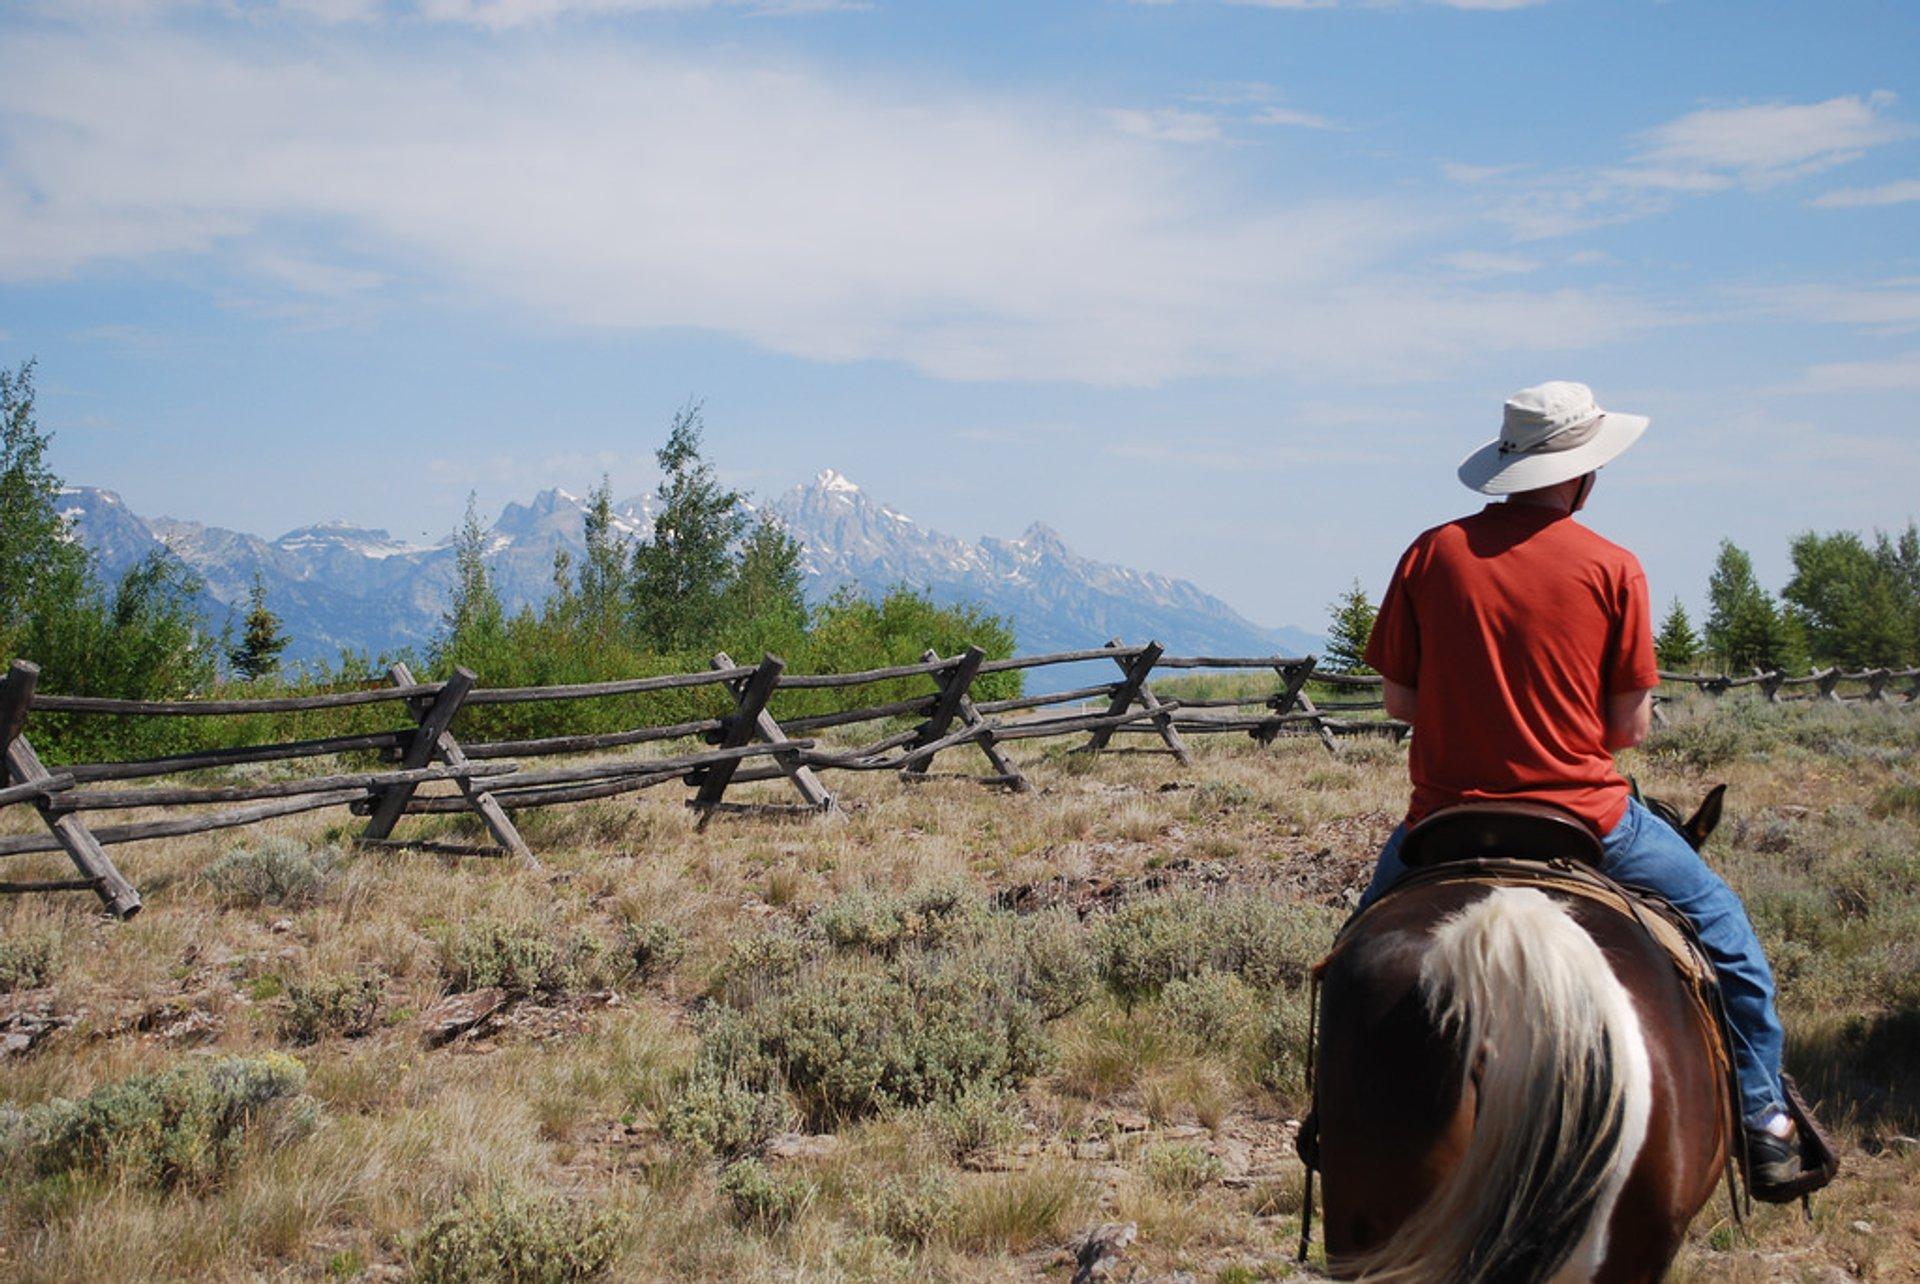 Horseback Riding in Yellowstone National Park - Best Season